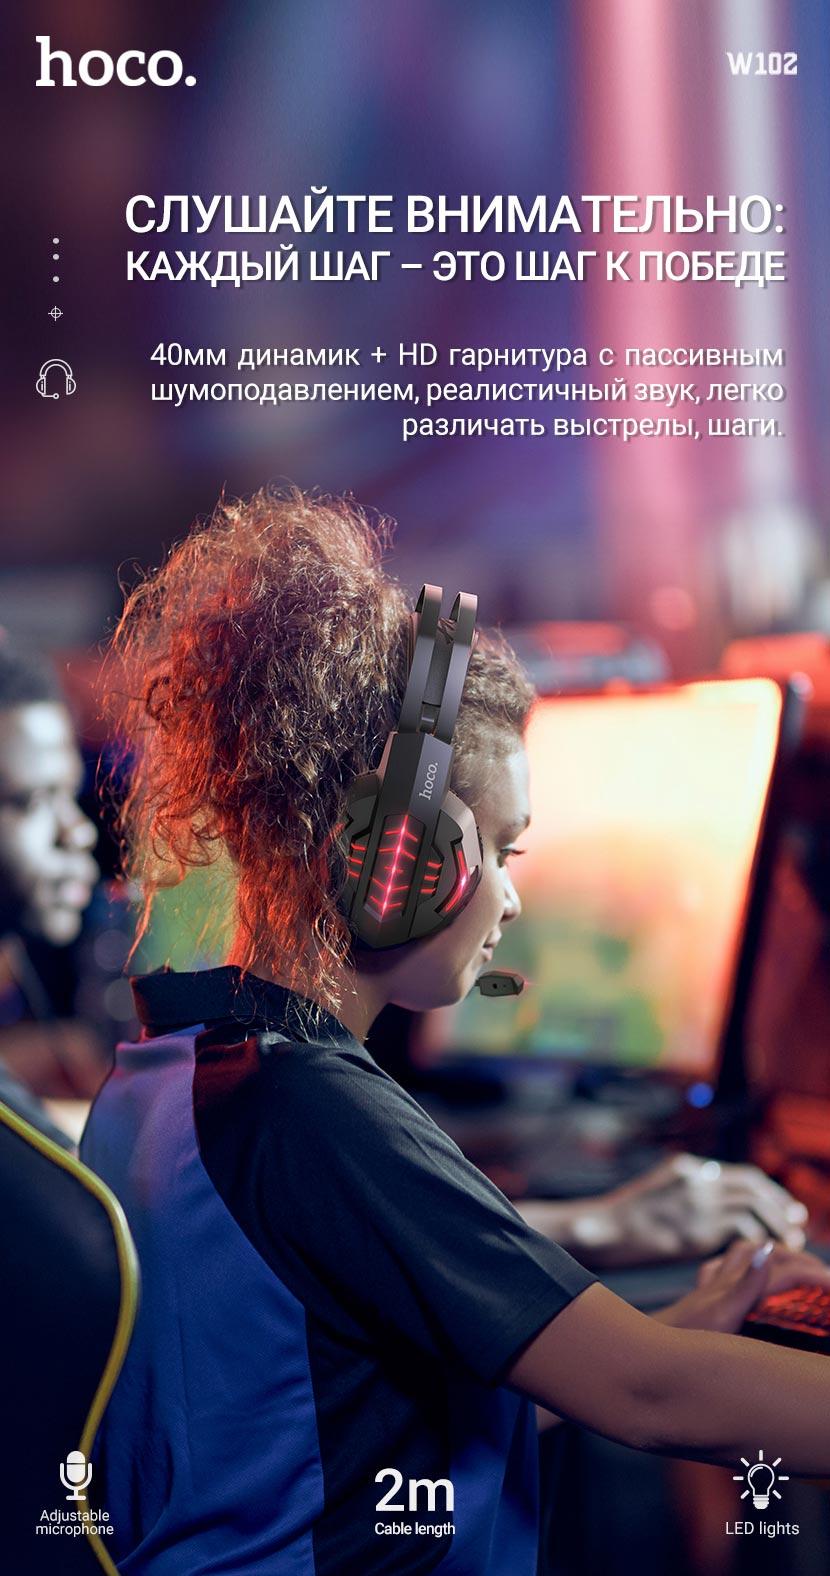 hoco news w102 cool tour gaming headphones win ru